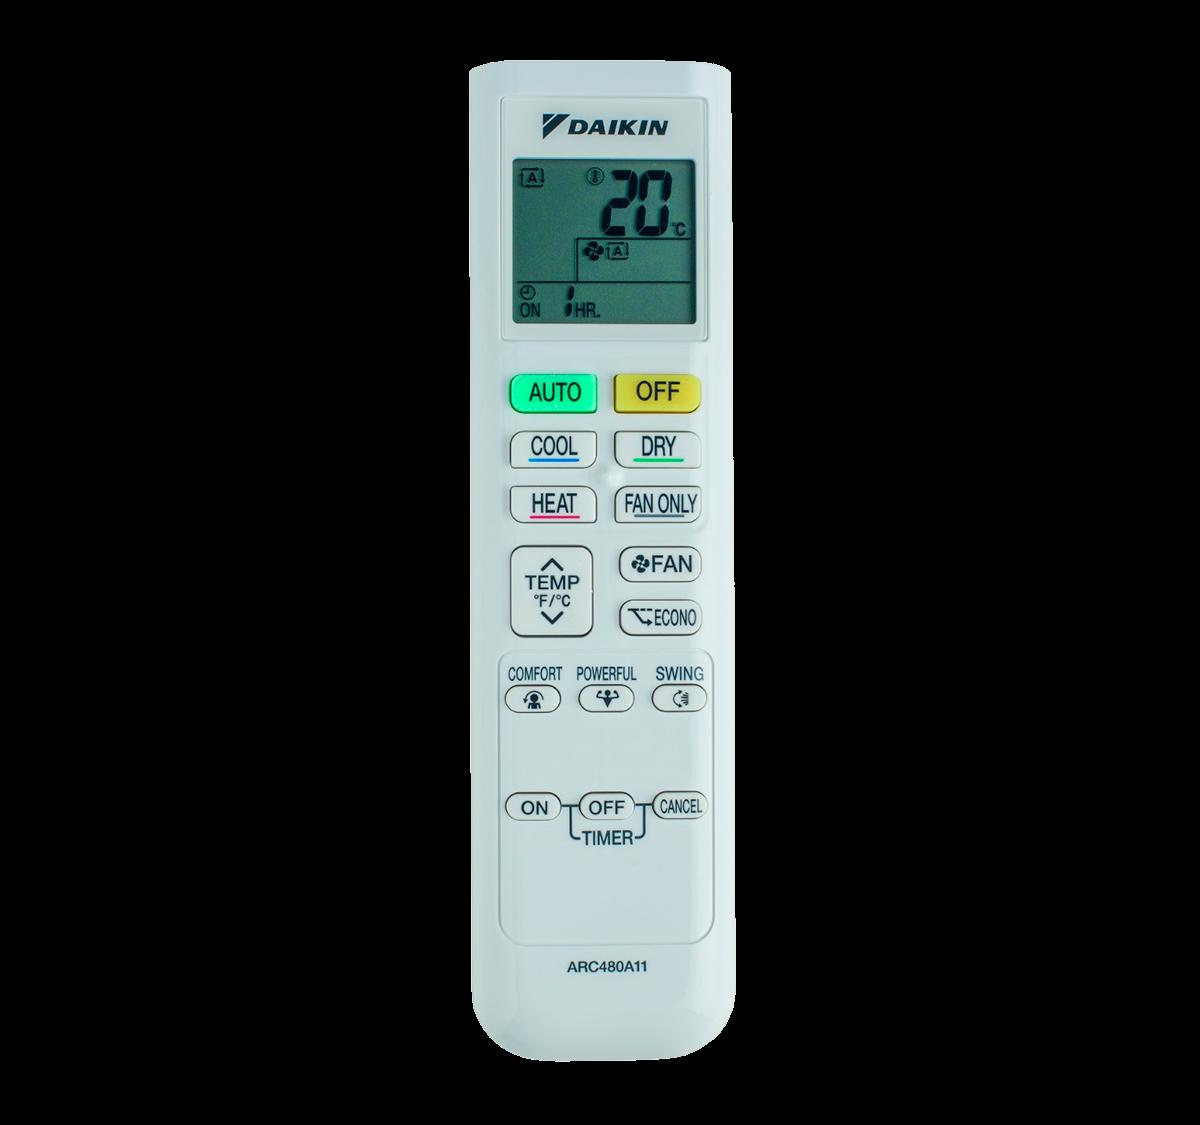 aire acondicionado conjunto split daikin inverter mando a diastanacia arc480a11 modelo comfora txp60m instalacion incluida caseragua